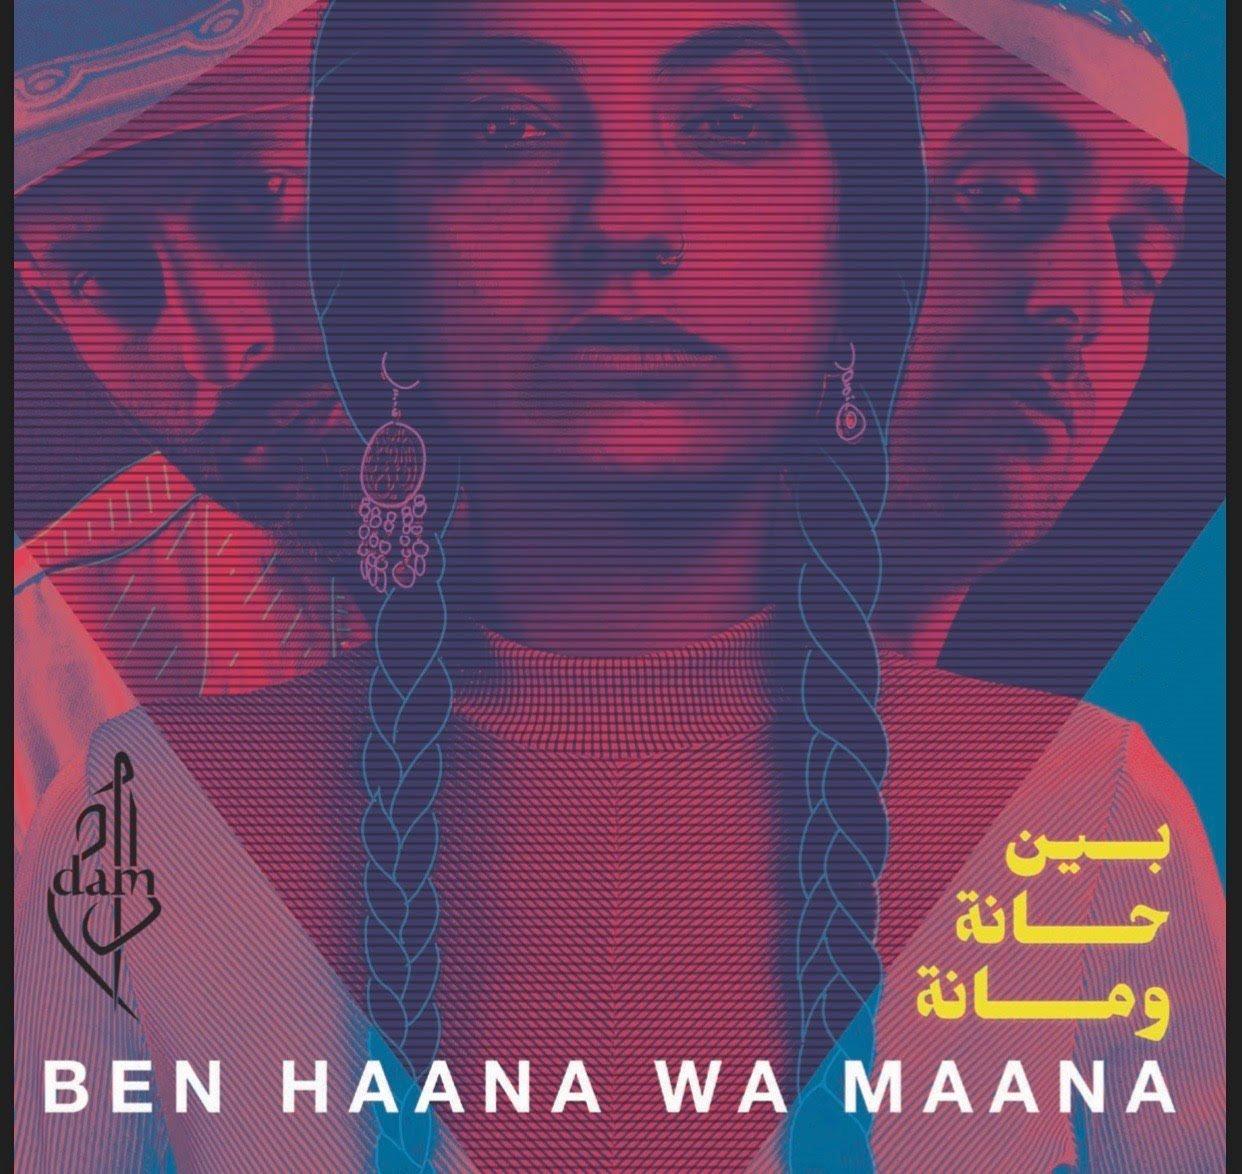 Palestinian hip hop pioneers DAM on tour